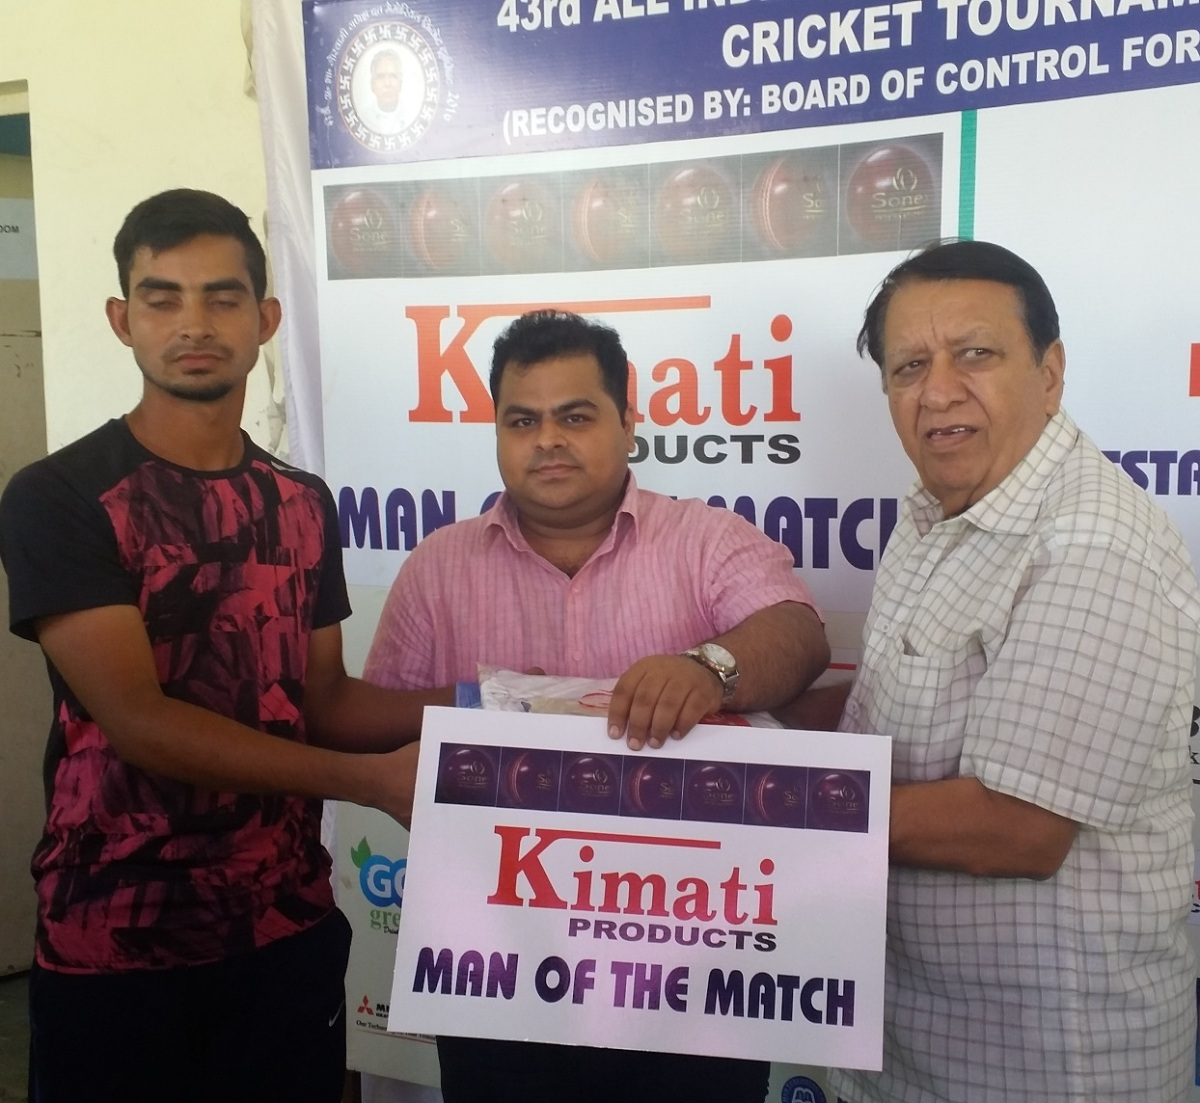 Hari Singh Academy beats Knight XI by 2 wickets in Goswami Ganesh Dutt Memorial